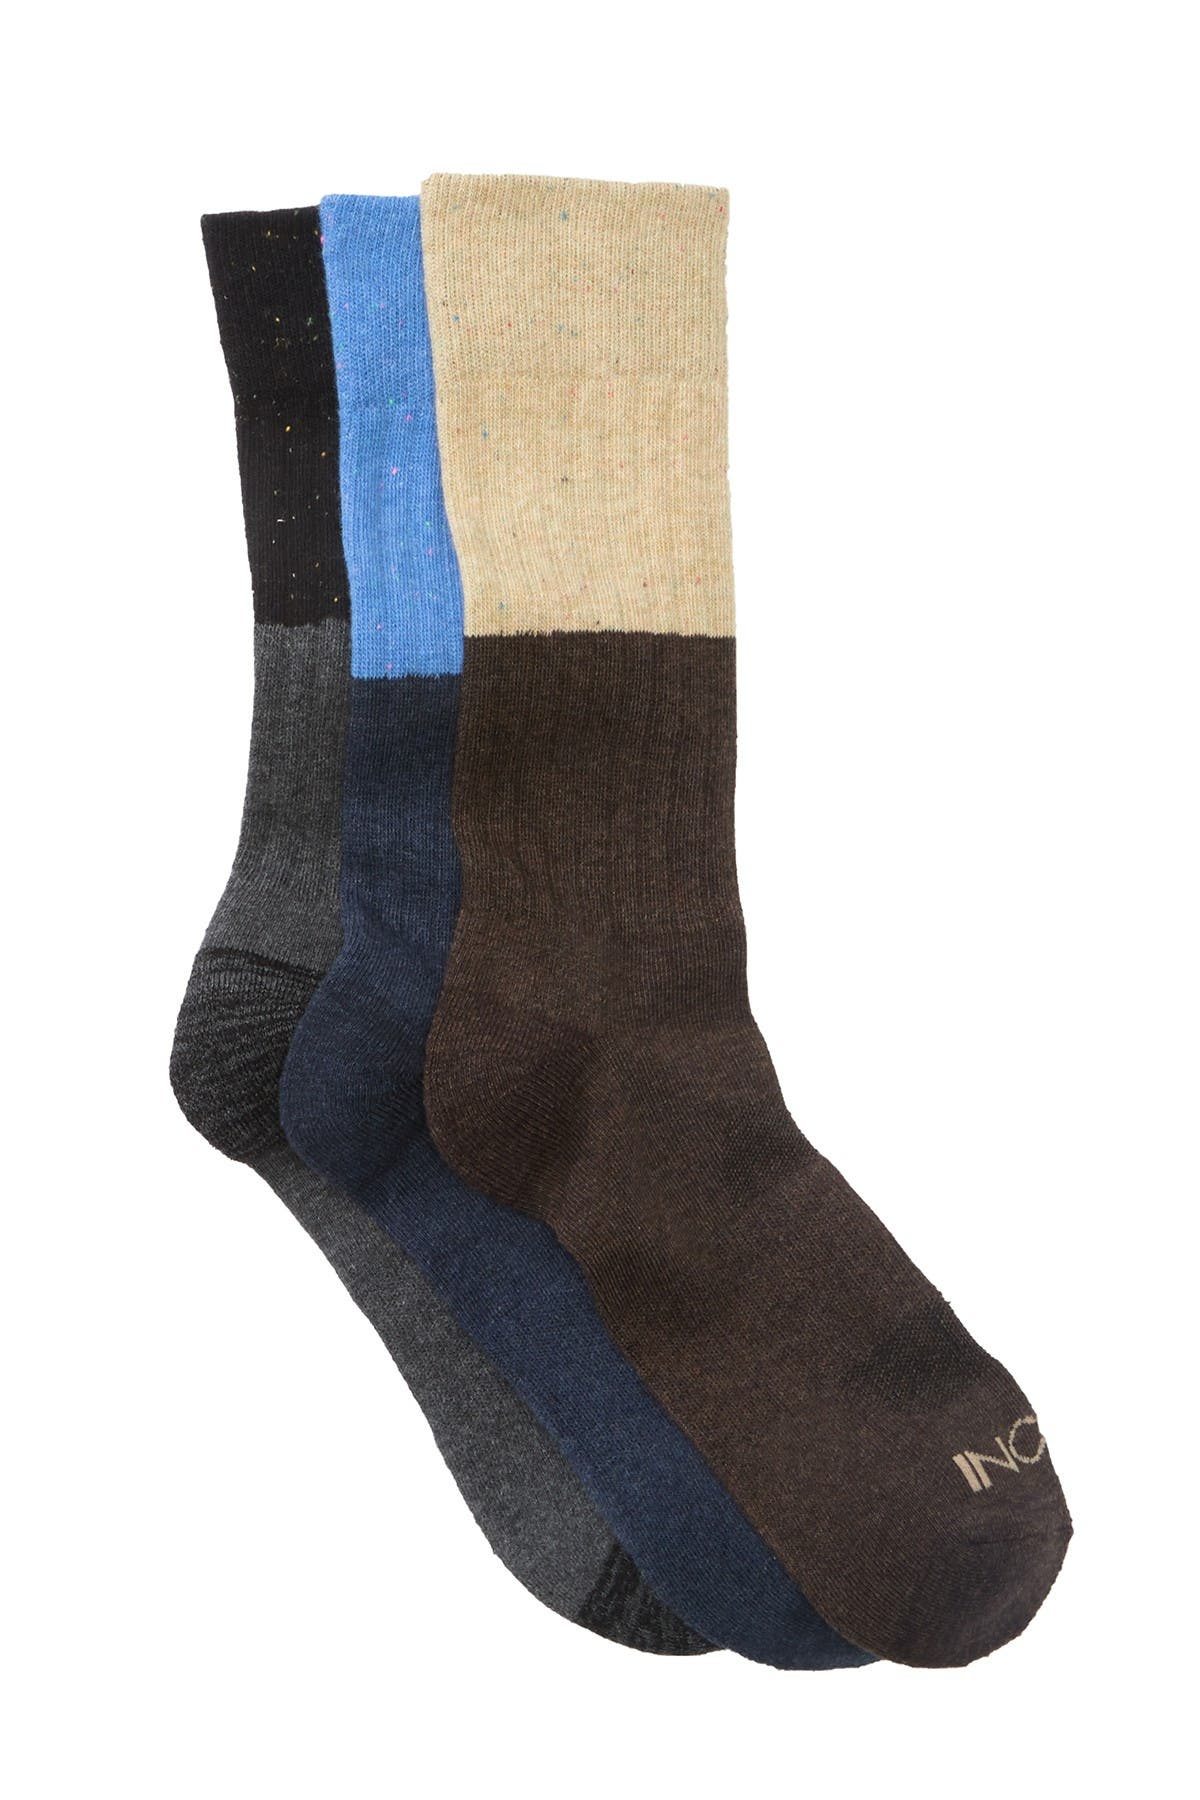 Image of BOCONI Nep Yarn Color Block Crew Socks - Pack of 3